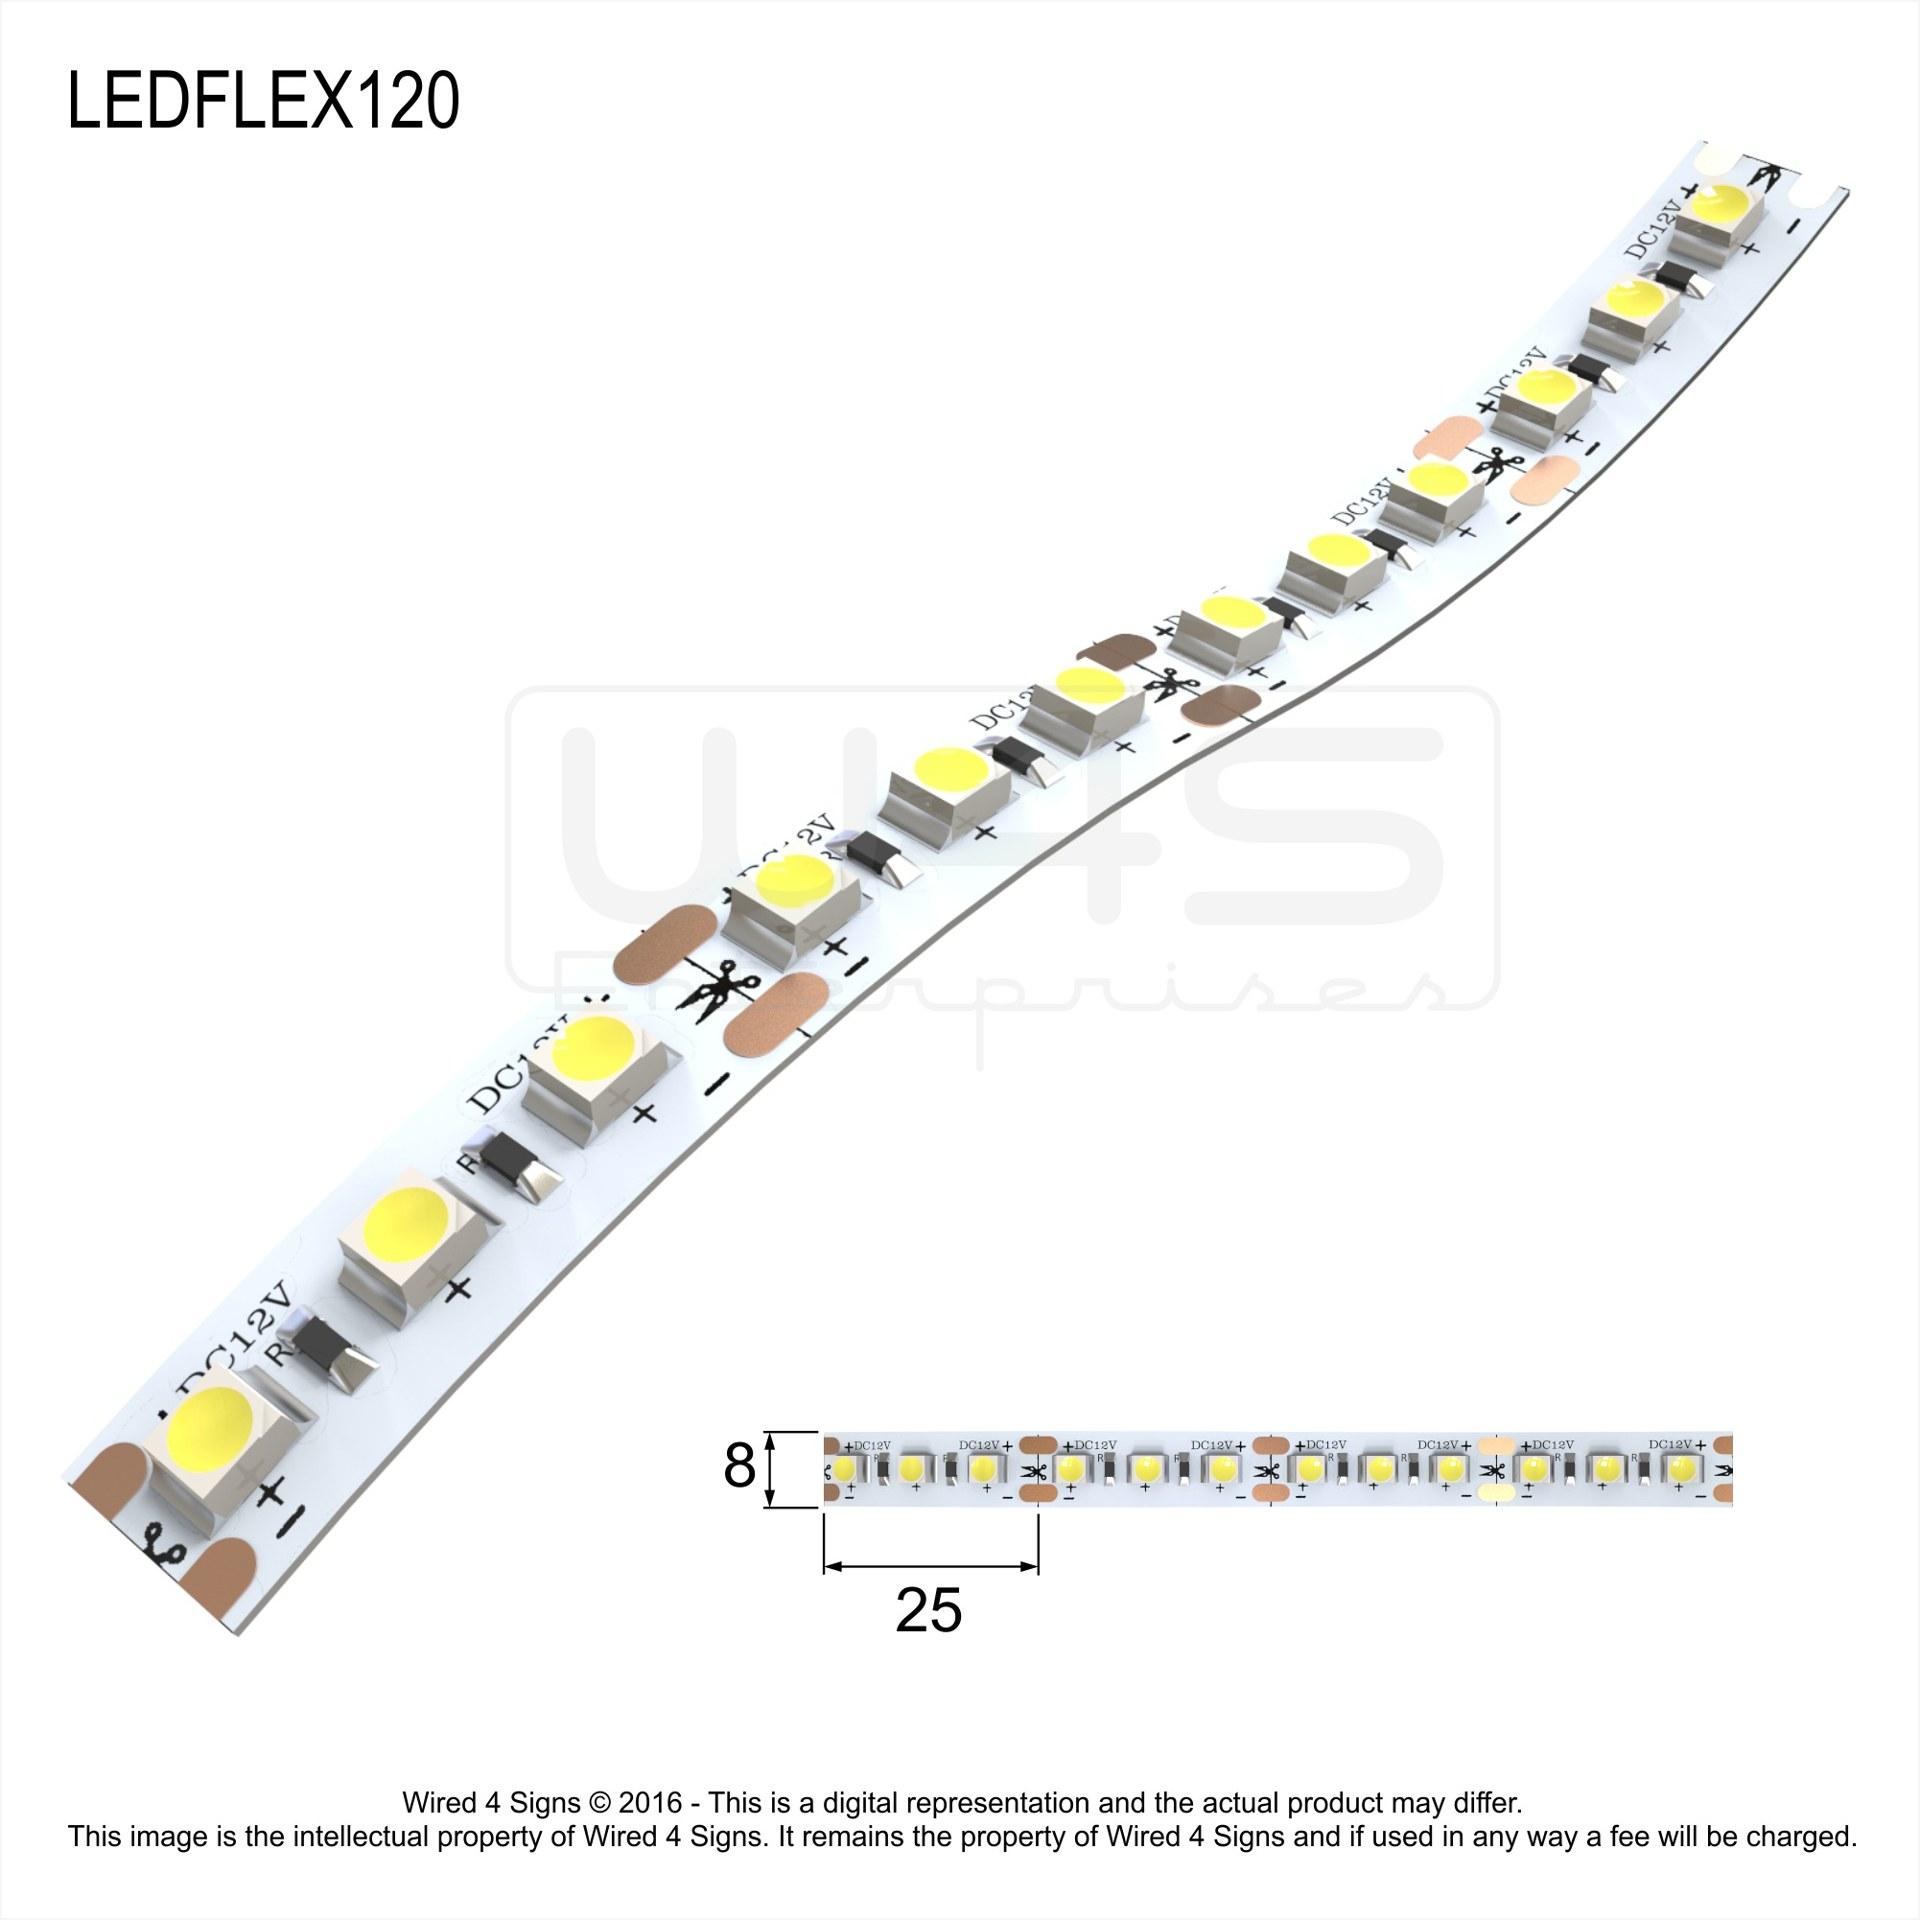 Led flex strip wired4signs led flex strip aloadofball Choice Image